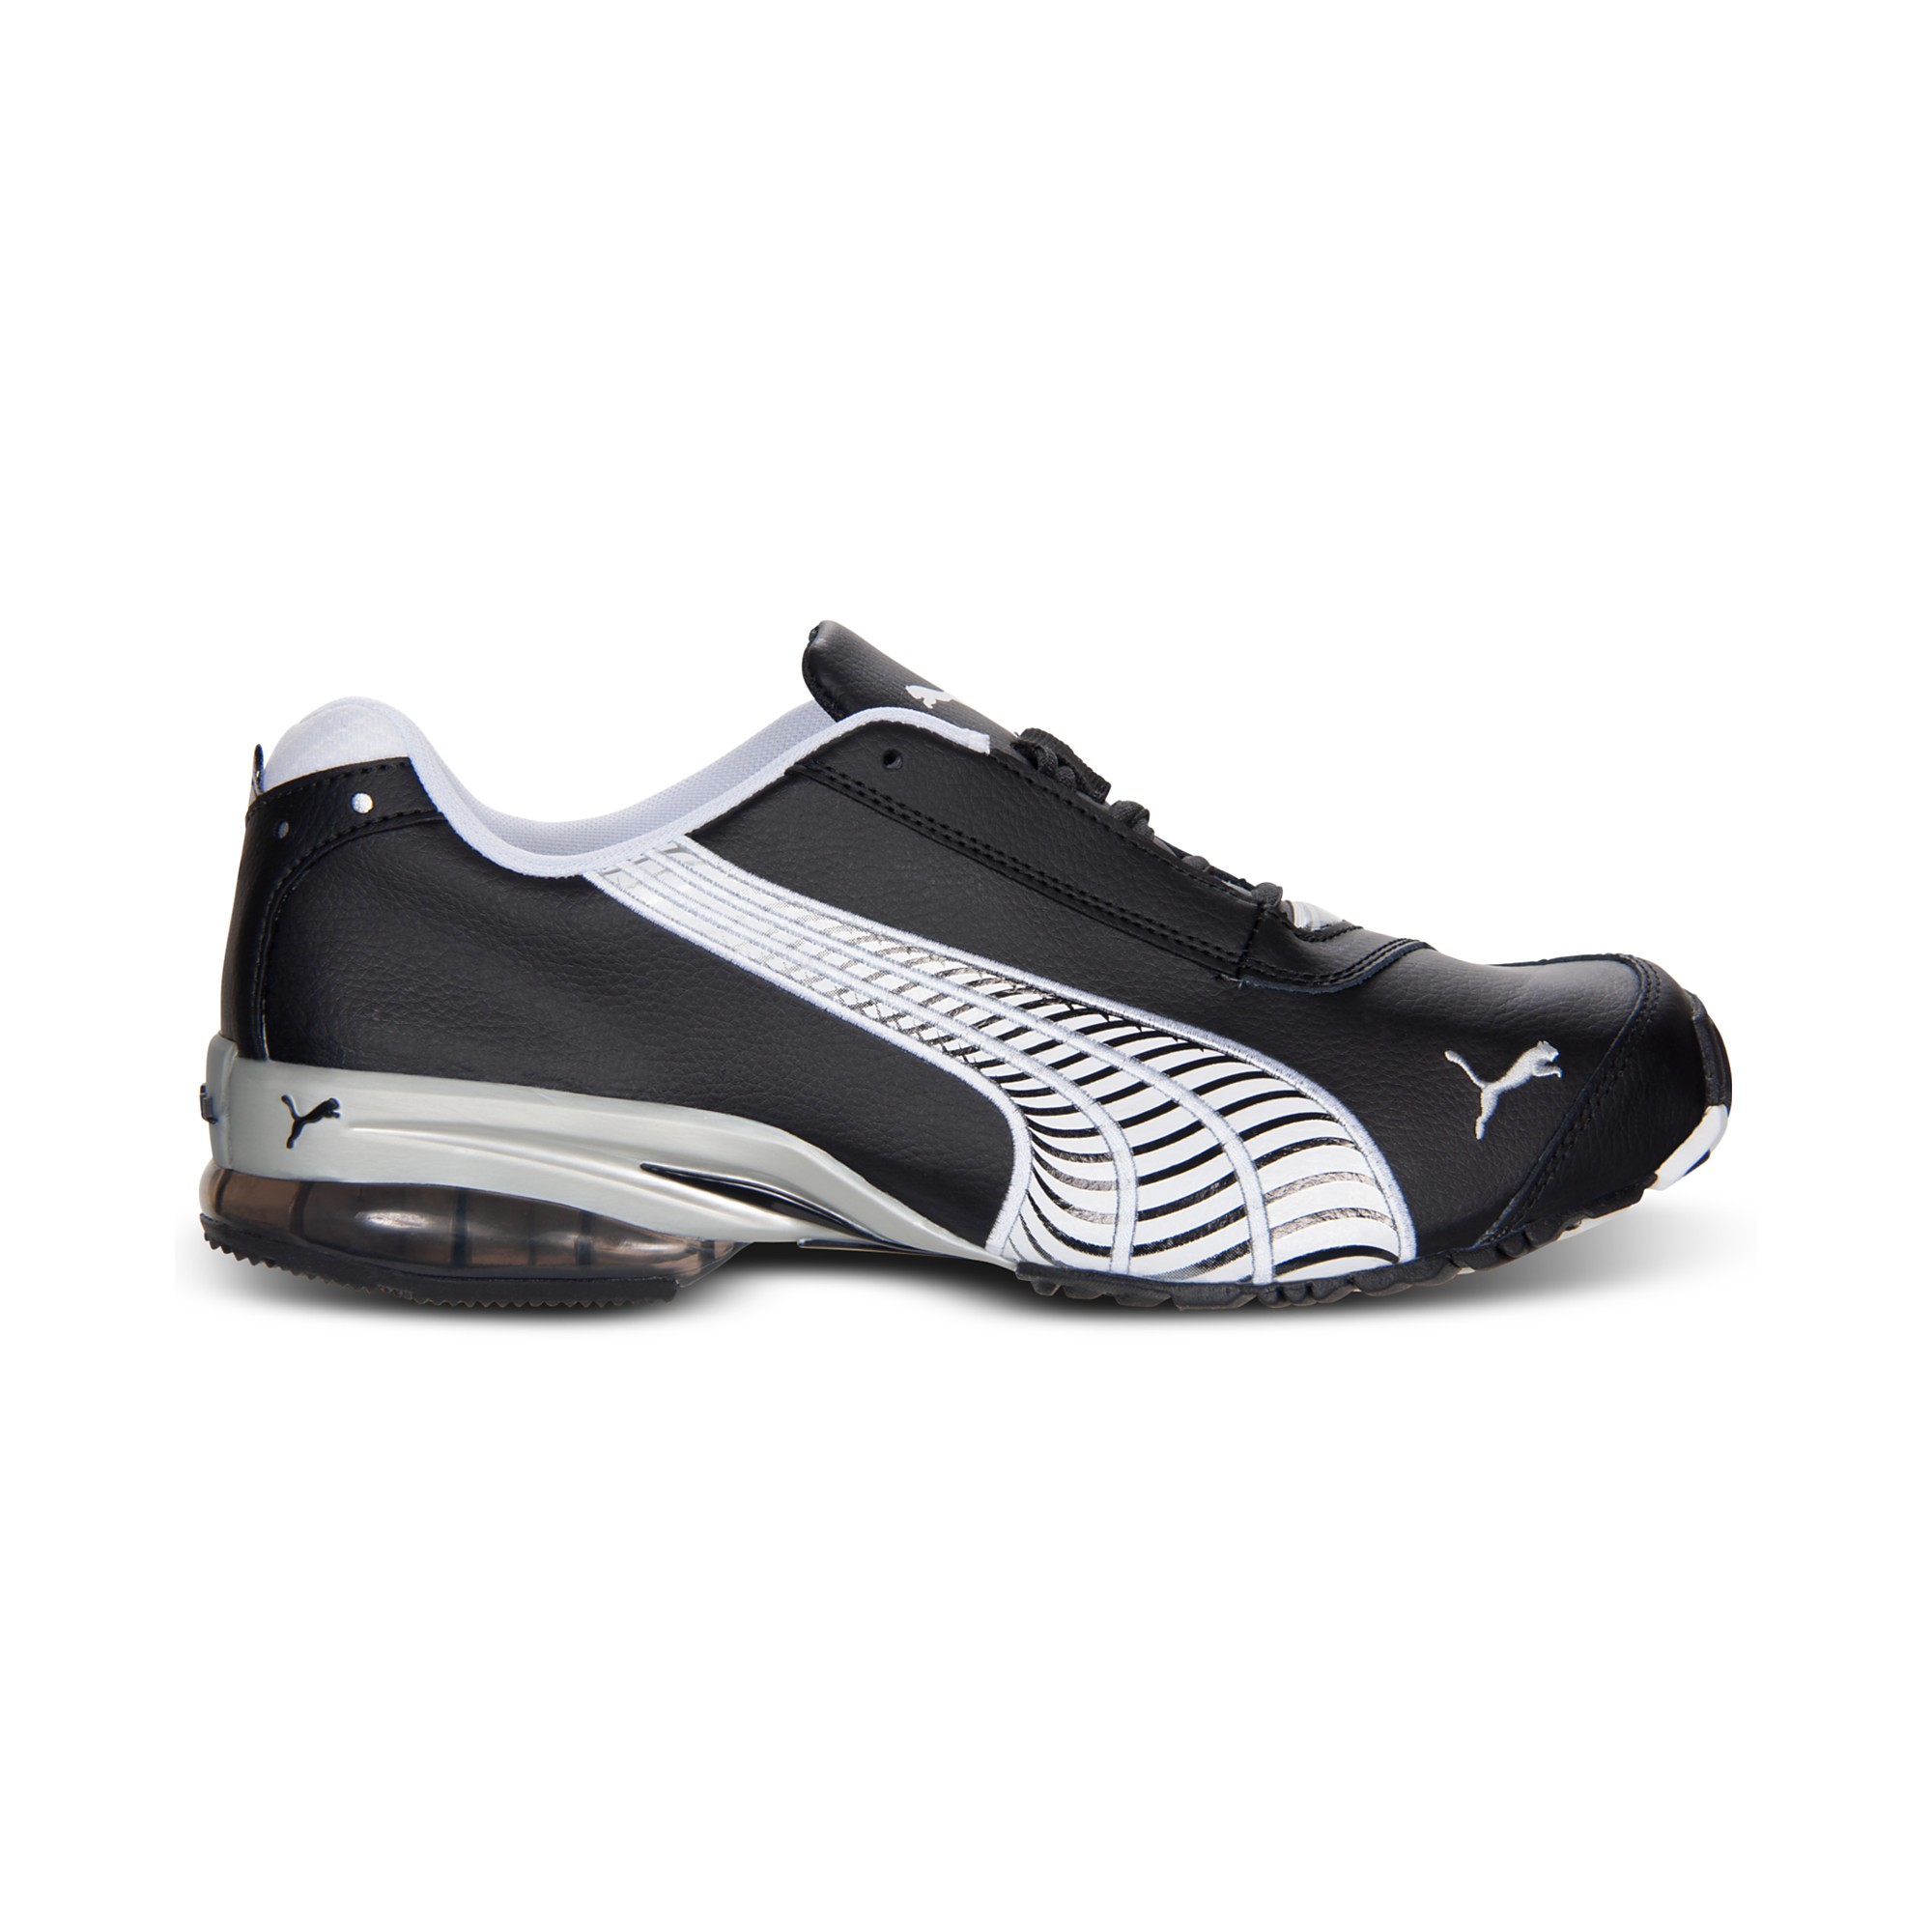 Puma Cell Jago Running Shoes